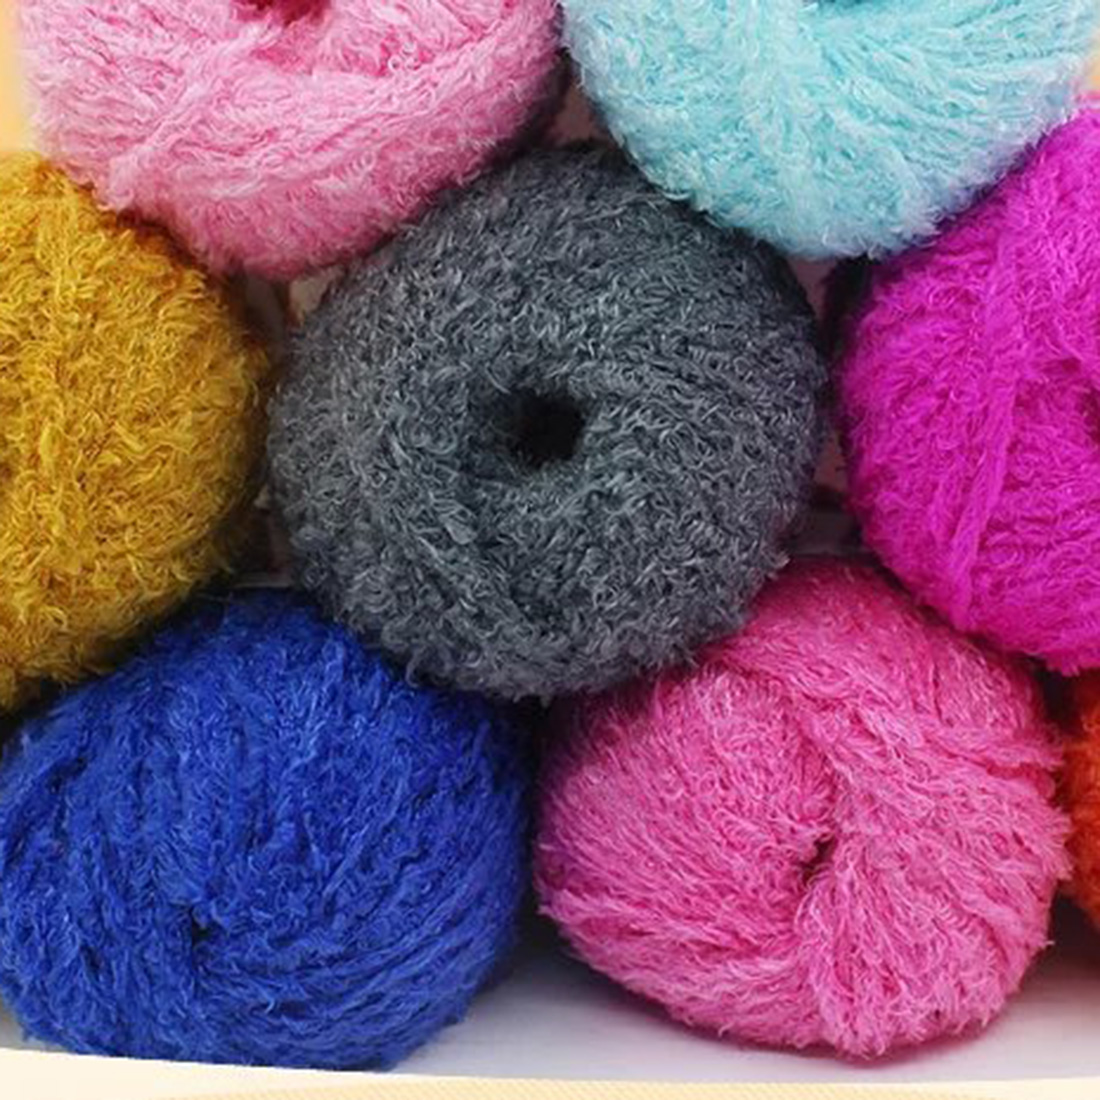 Велика мека топла дуга коса памучна - Уметност, занатство и шивање - Фотографија 4